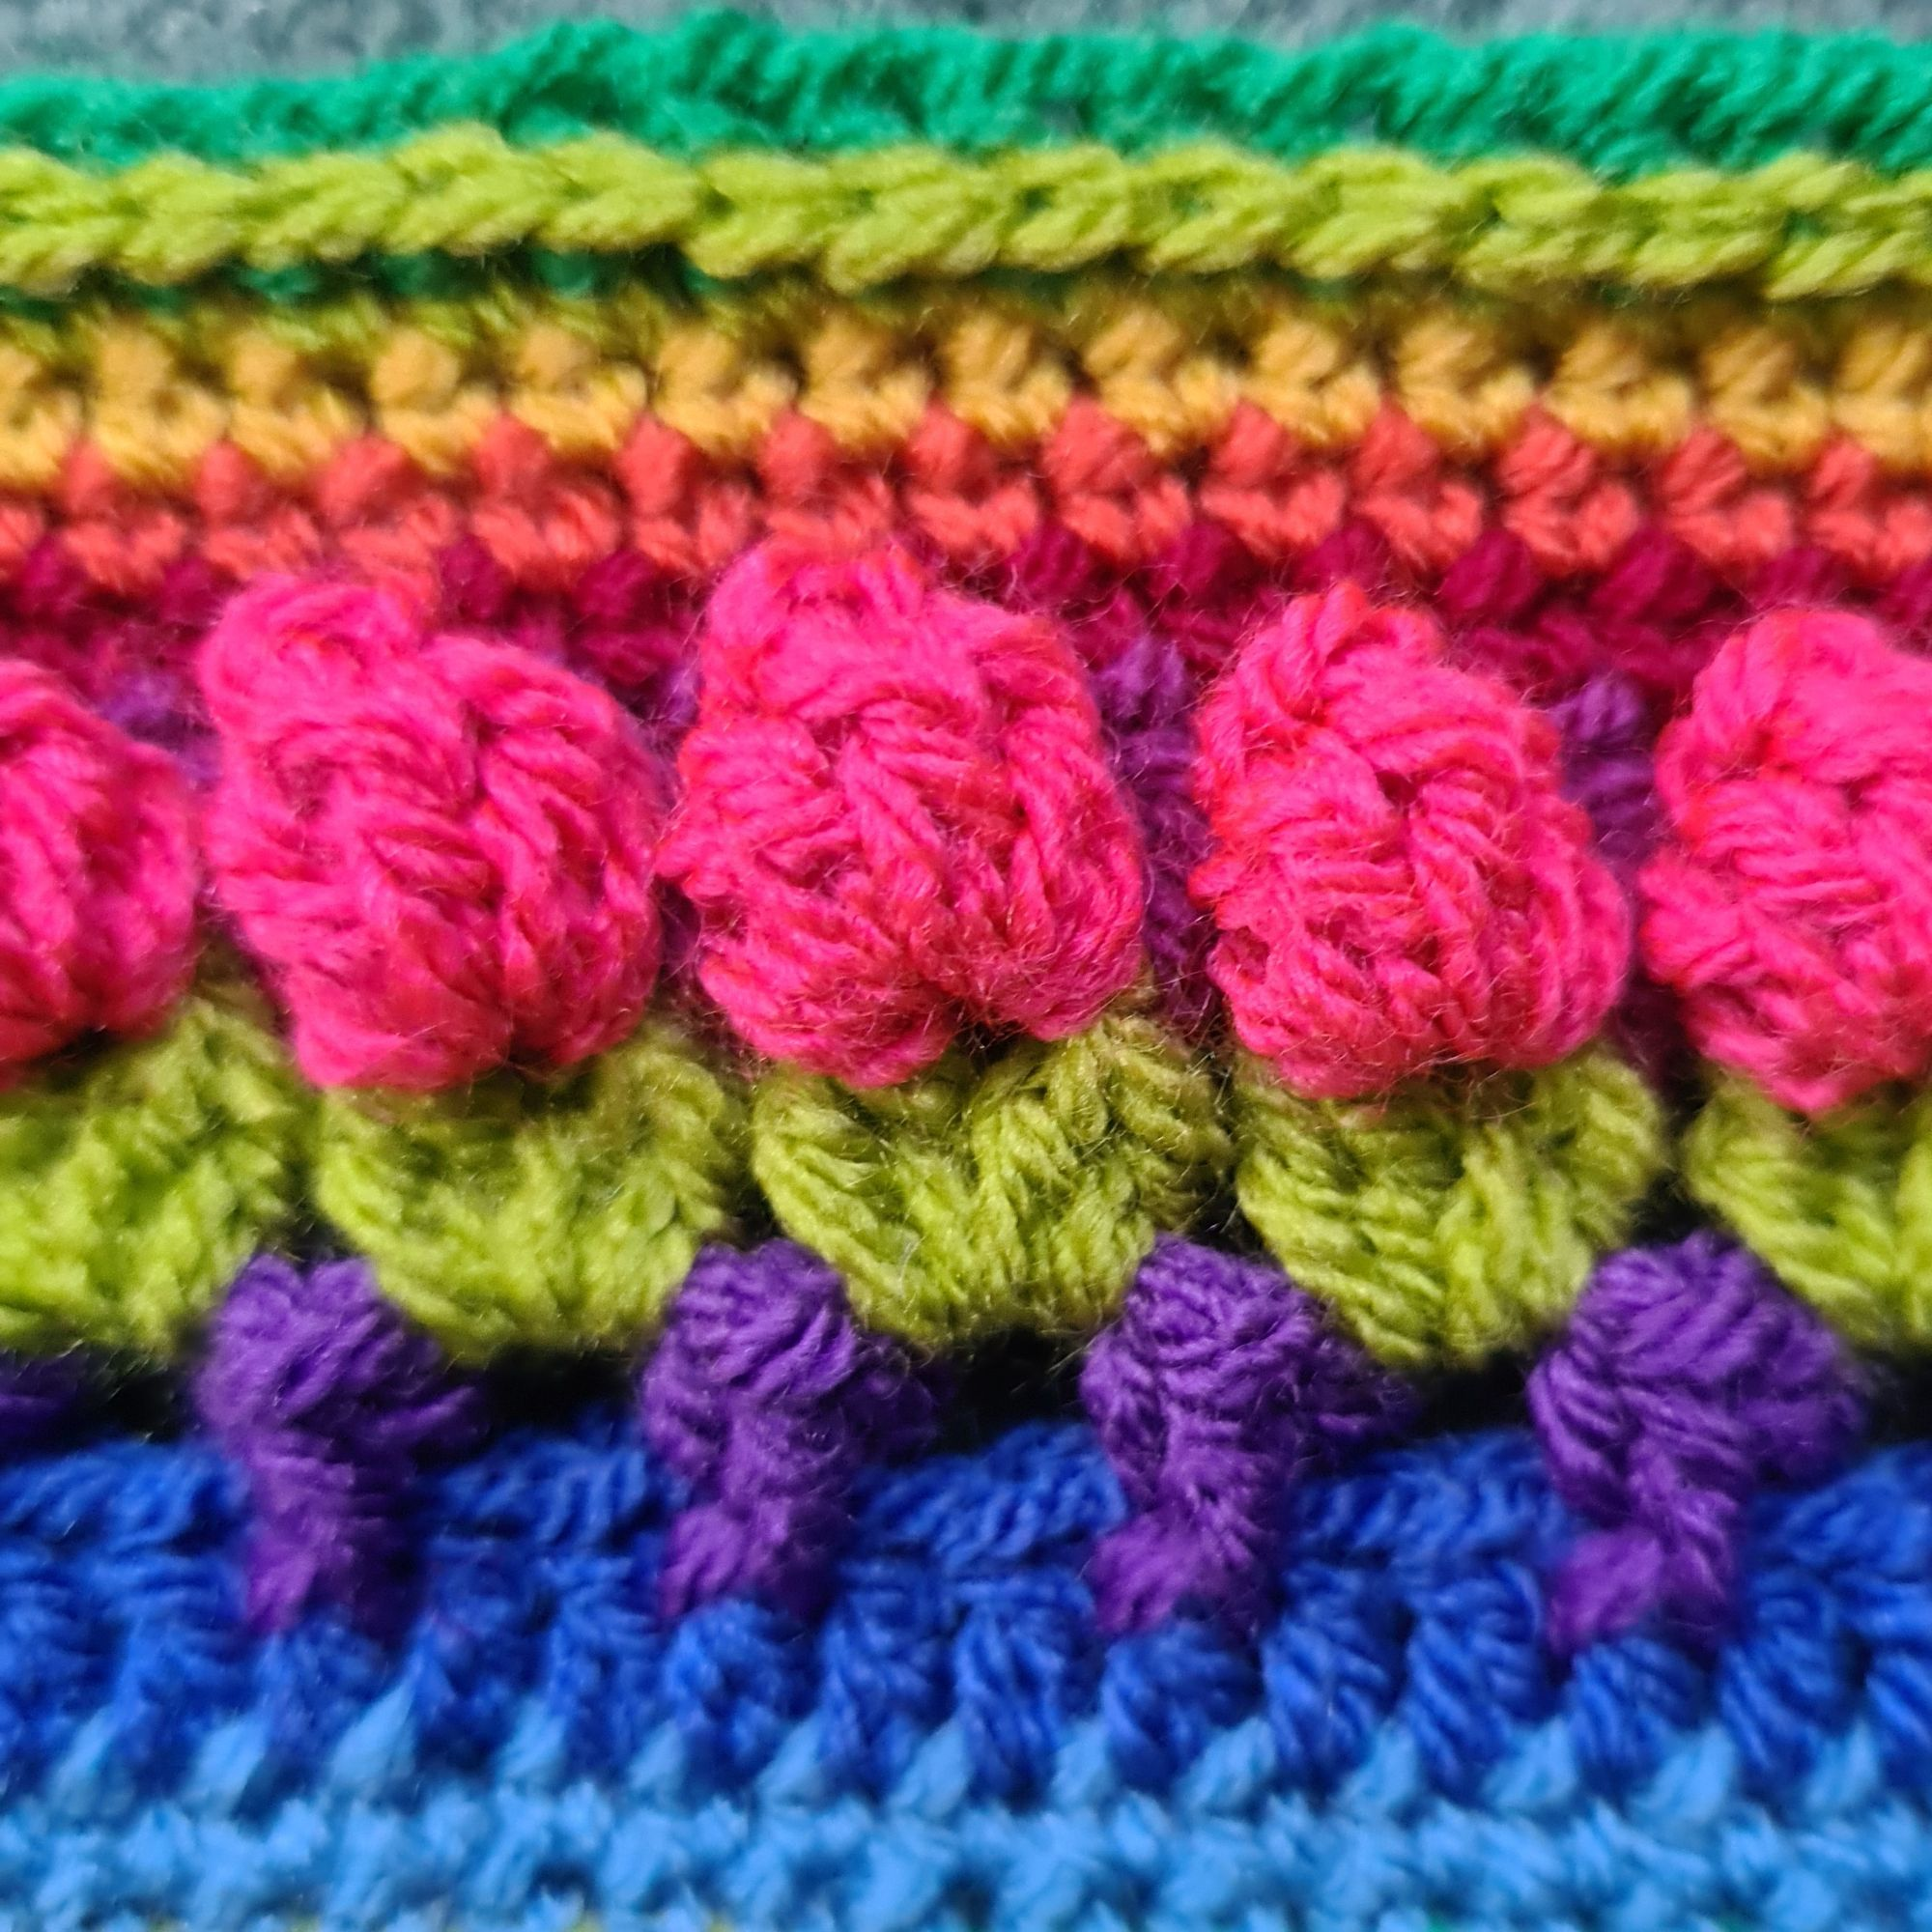 Diana Bensted - Crochet masterclass 10 tulip border